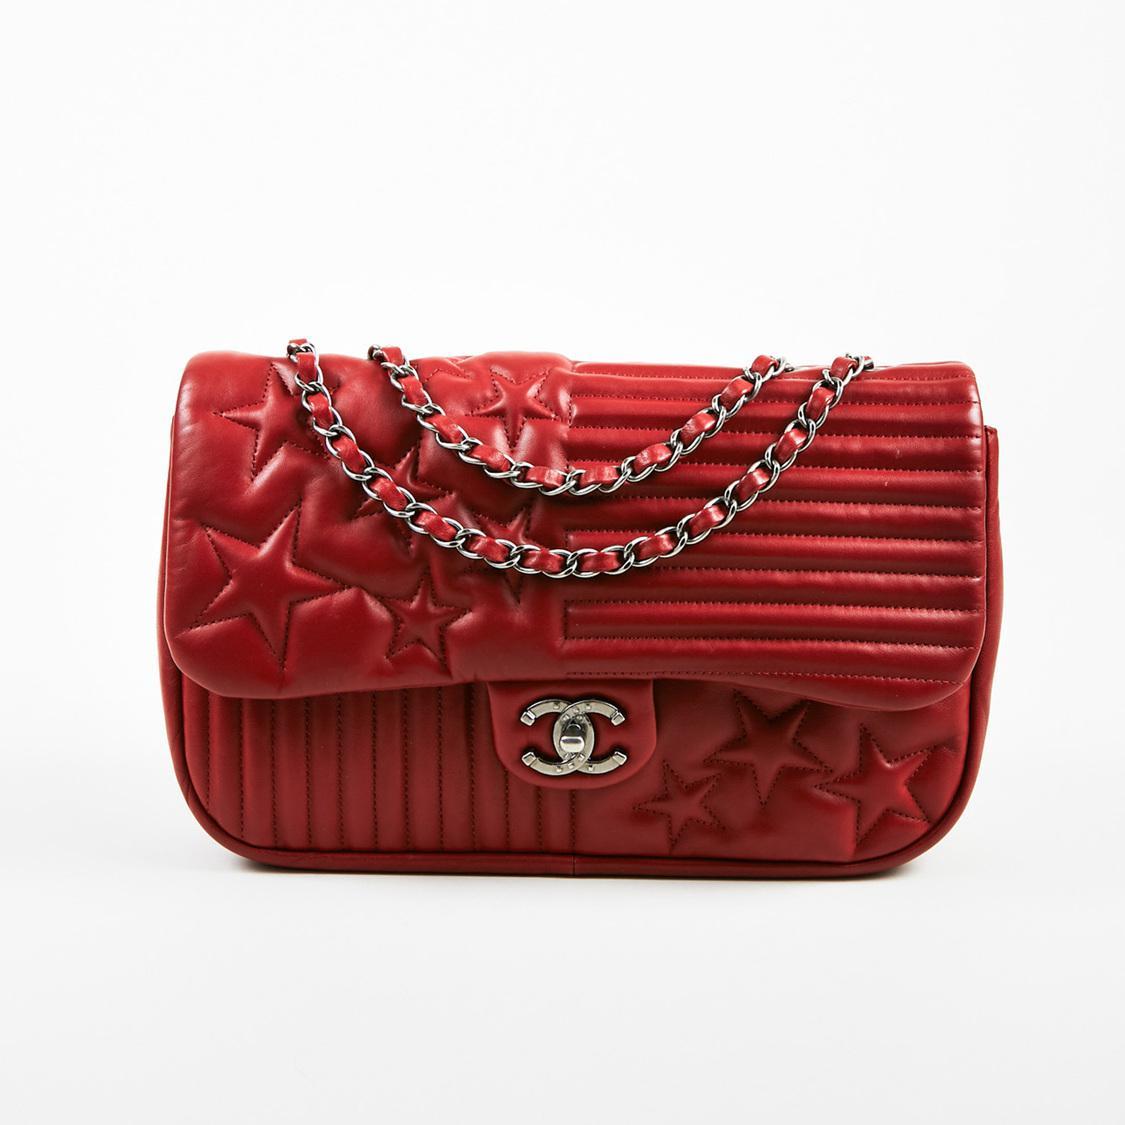 813674adf92e Lyst - Chanel Fall 2014